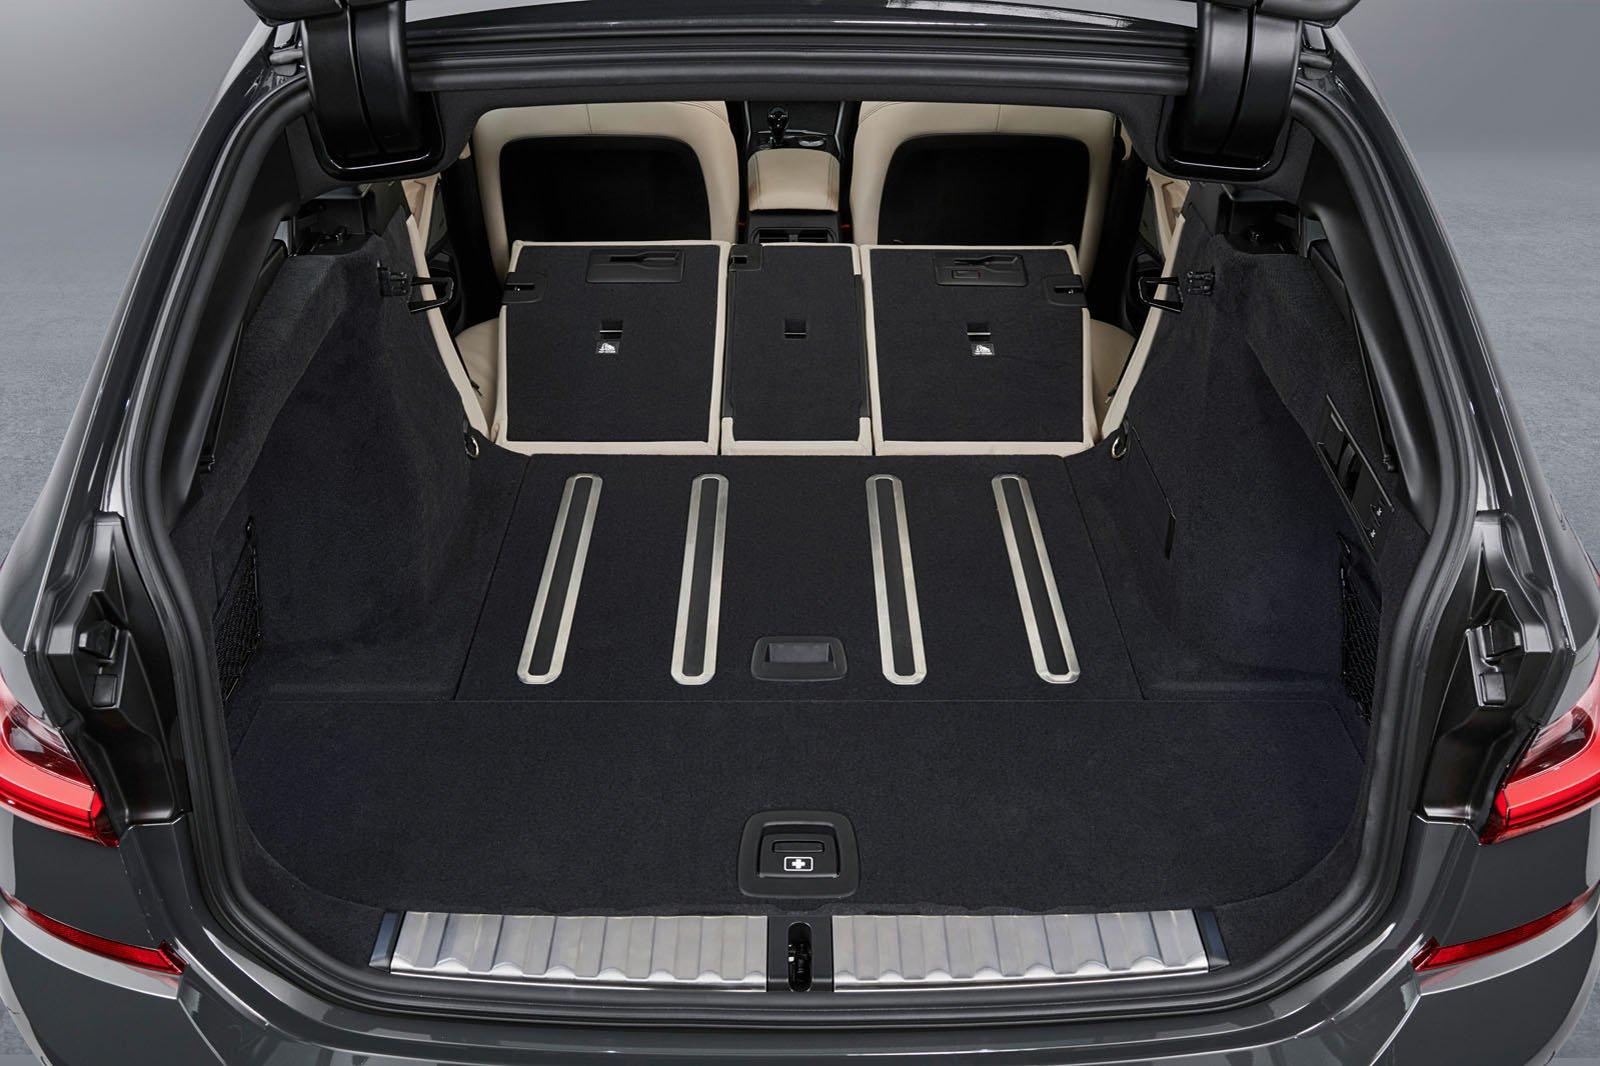 2019 BMW 3 Series Touring boot